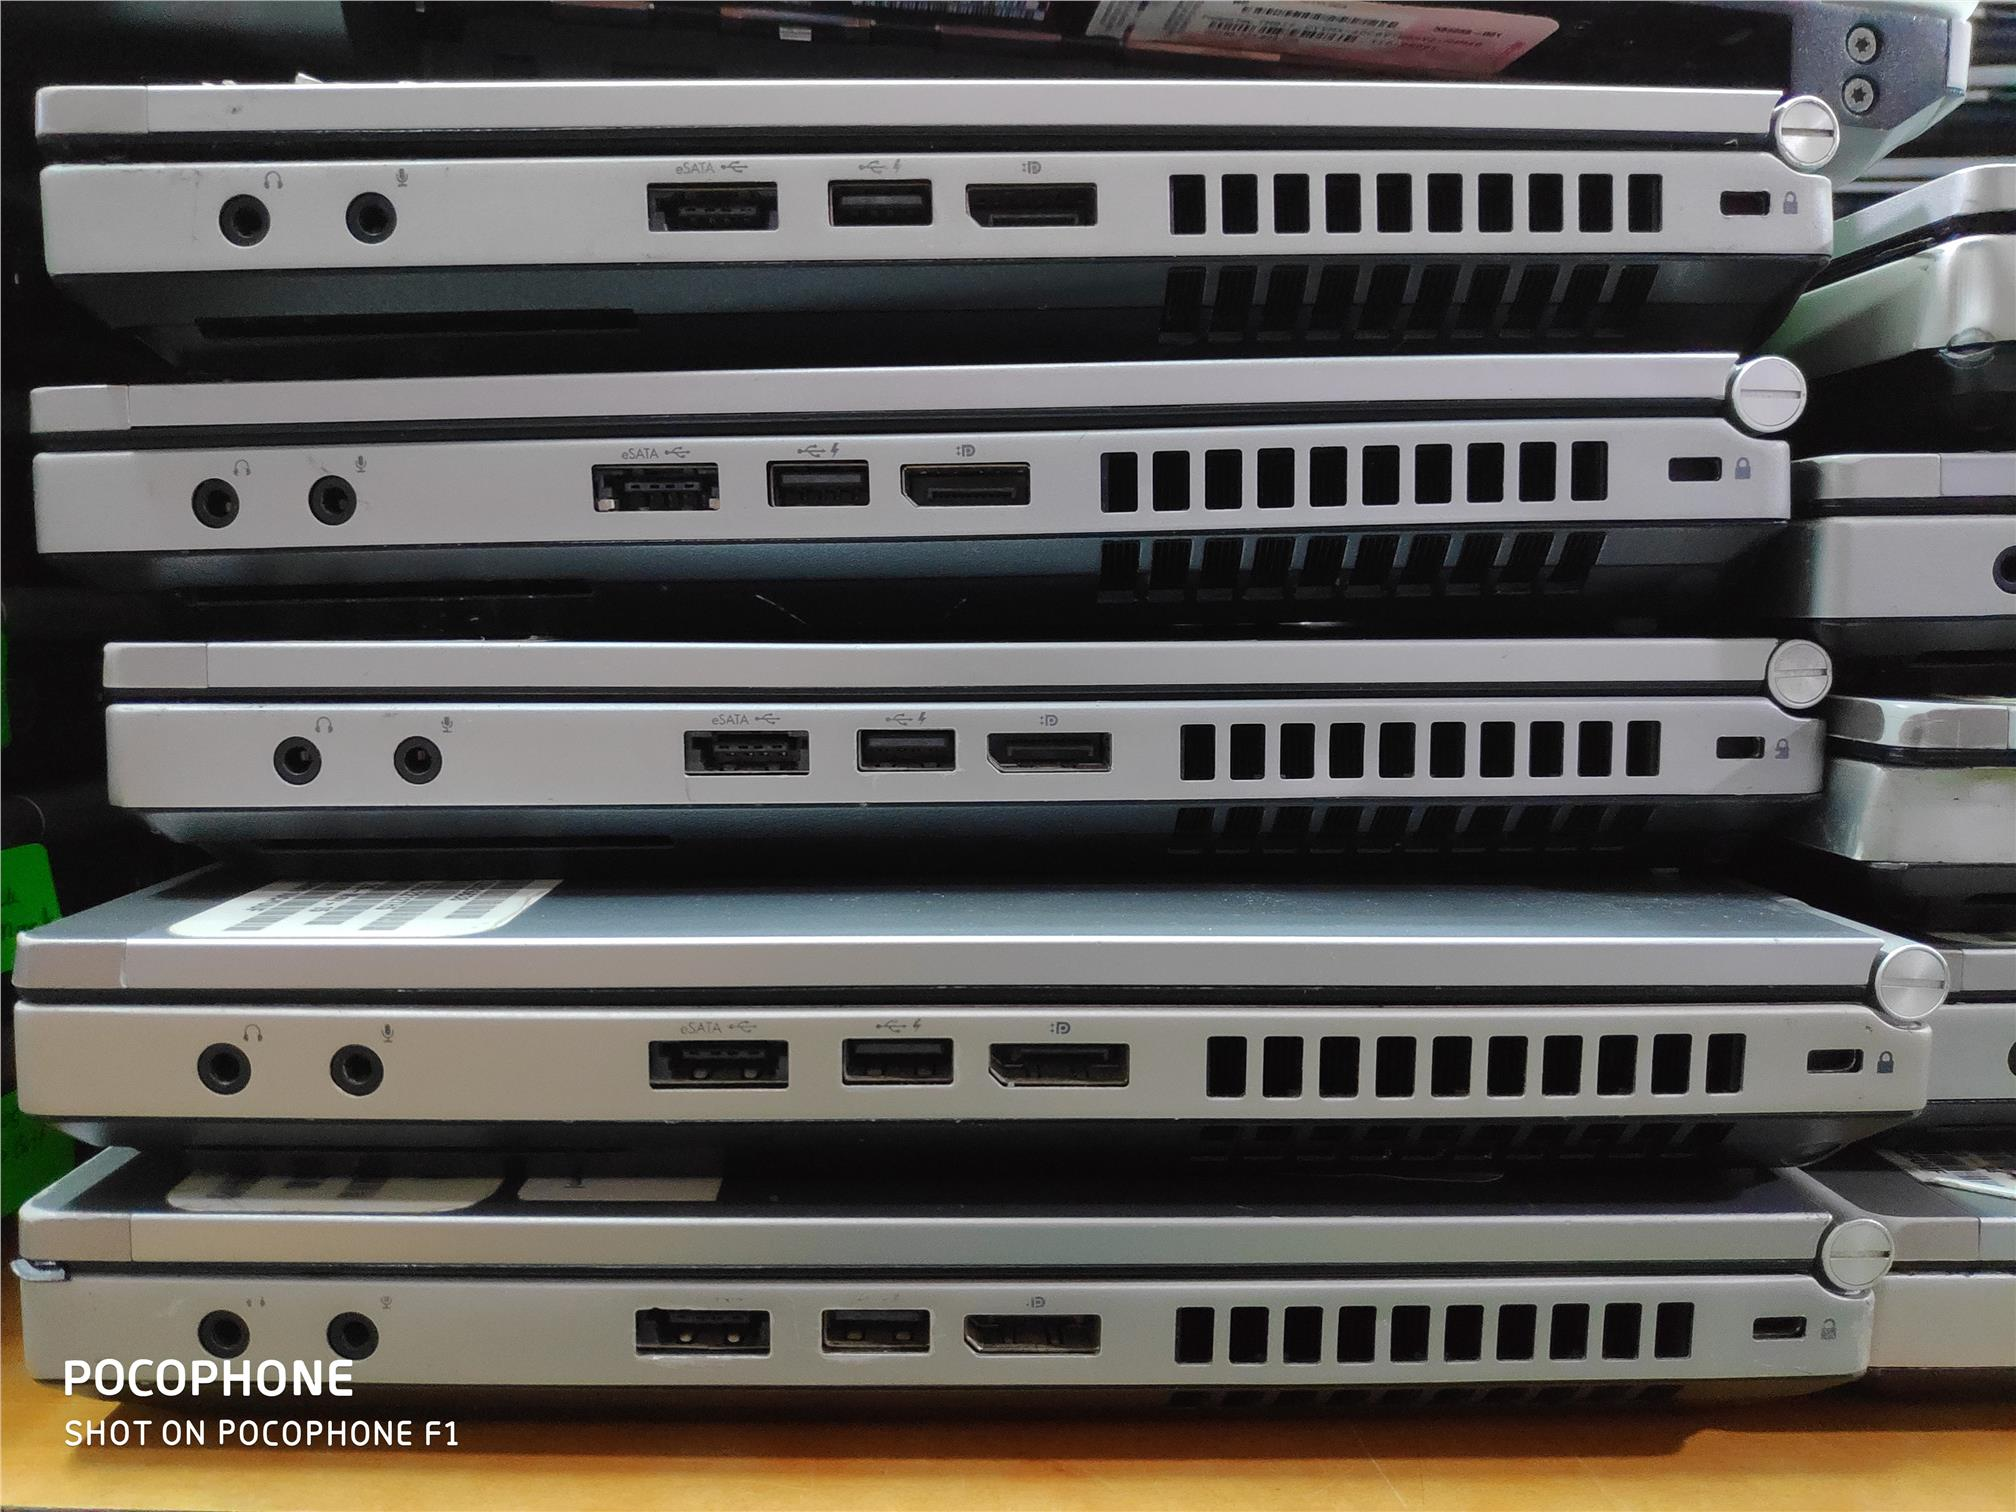 REFURBISHED HP ELITEBOOK 8470P INTEL CORE i5 4GB 160GB SSD WINDOWS OS